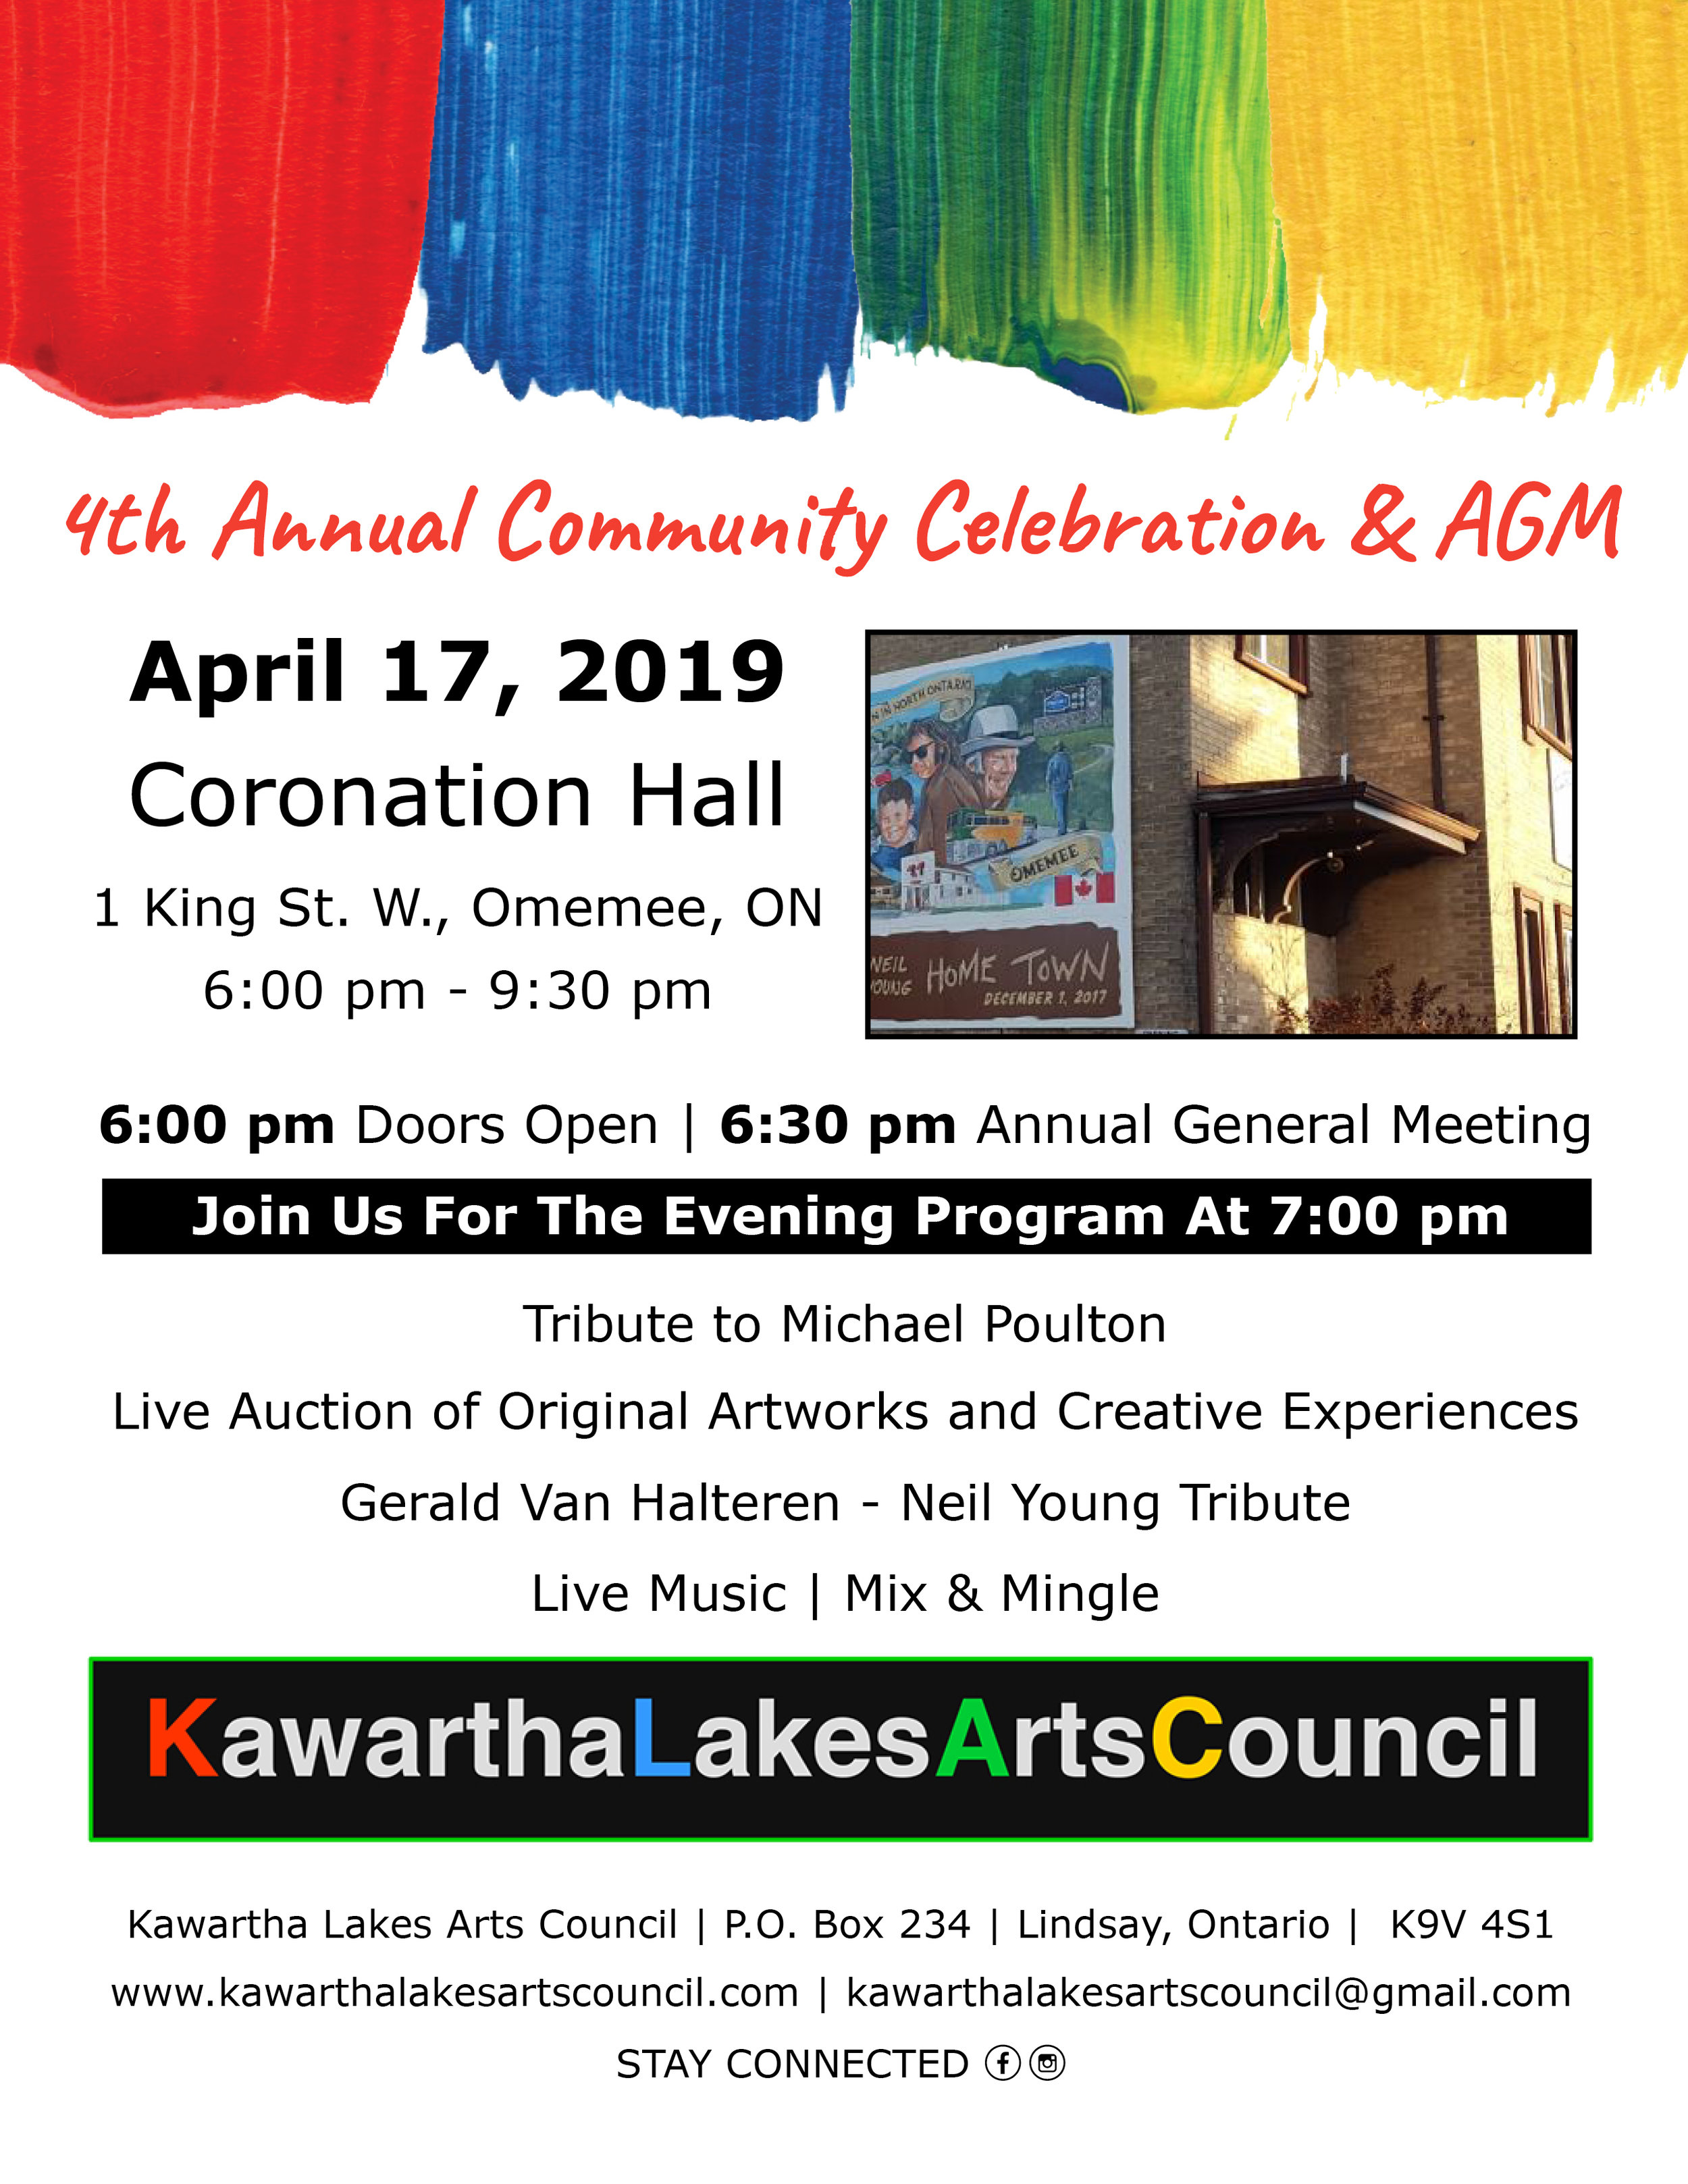 KLAC - AGM Event Poster.jpg